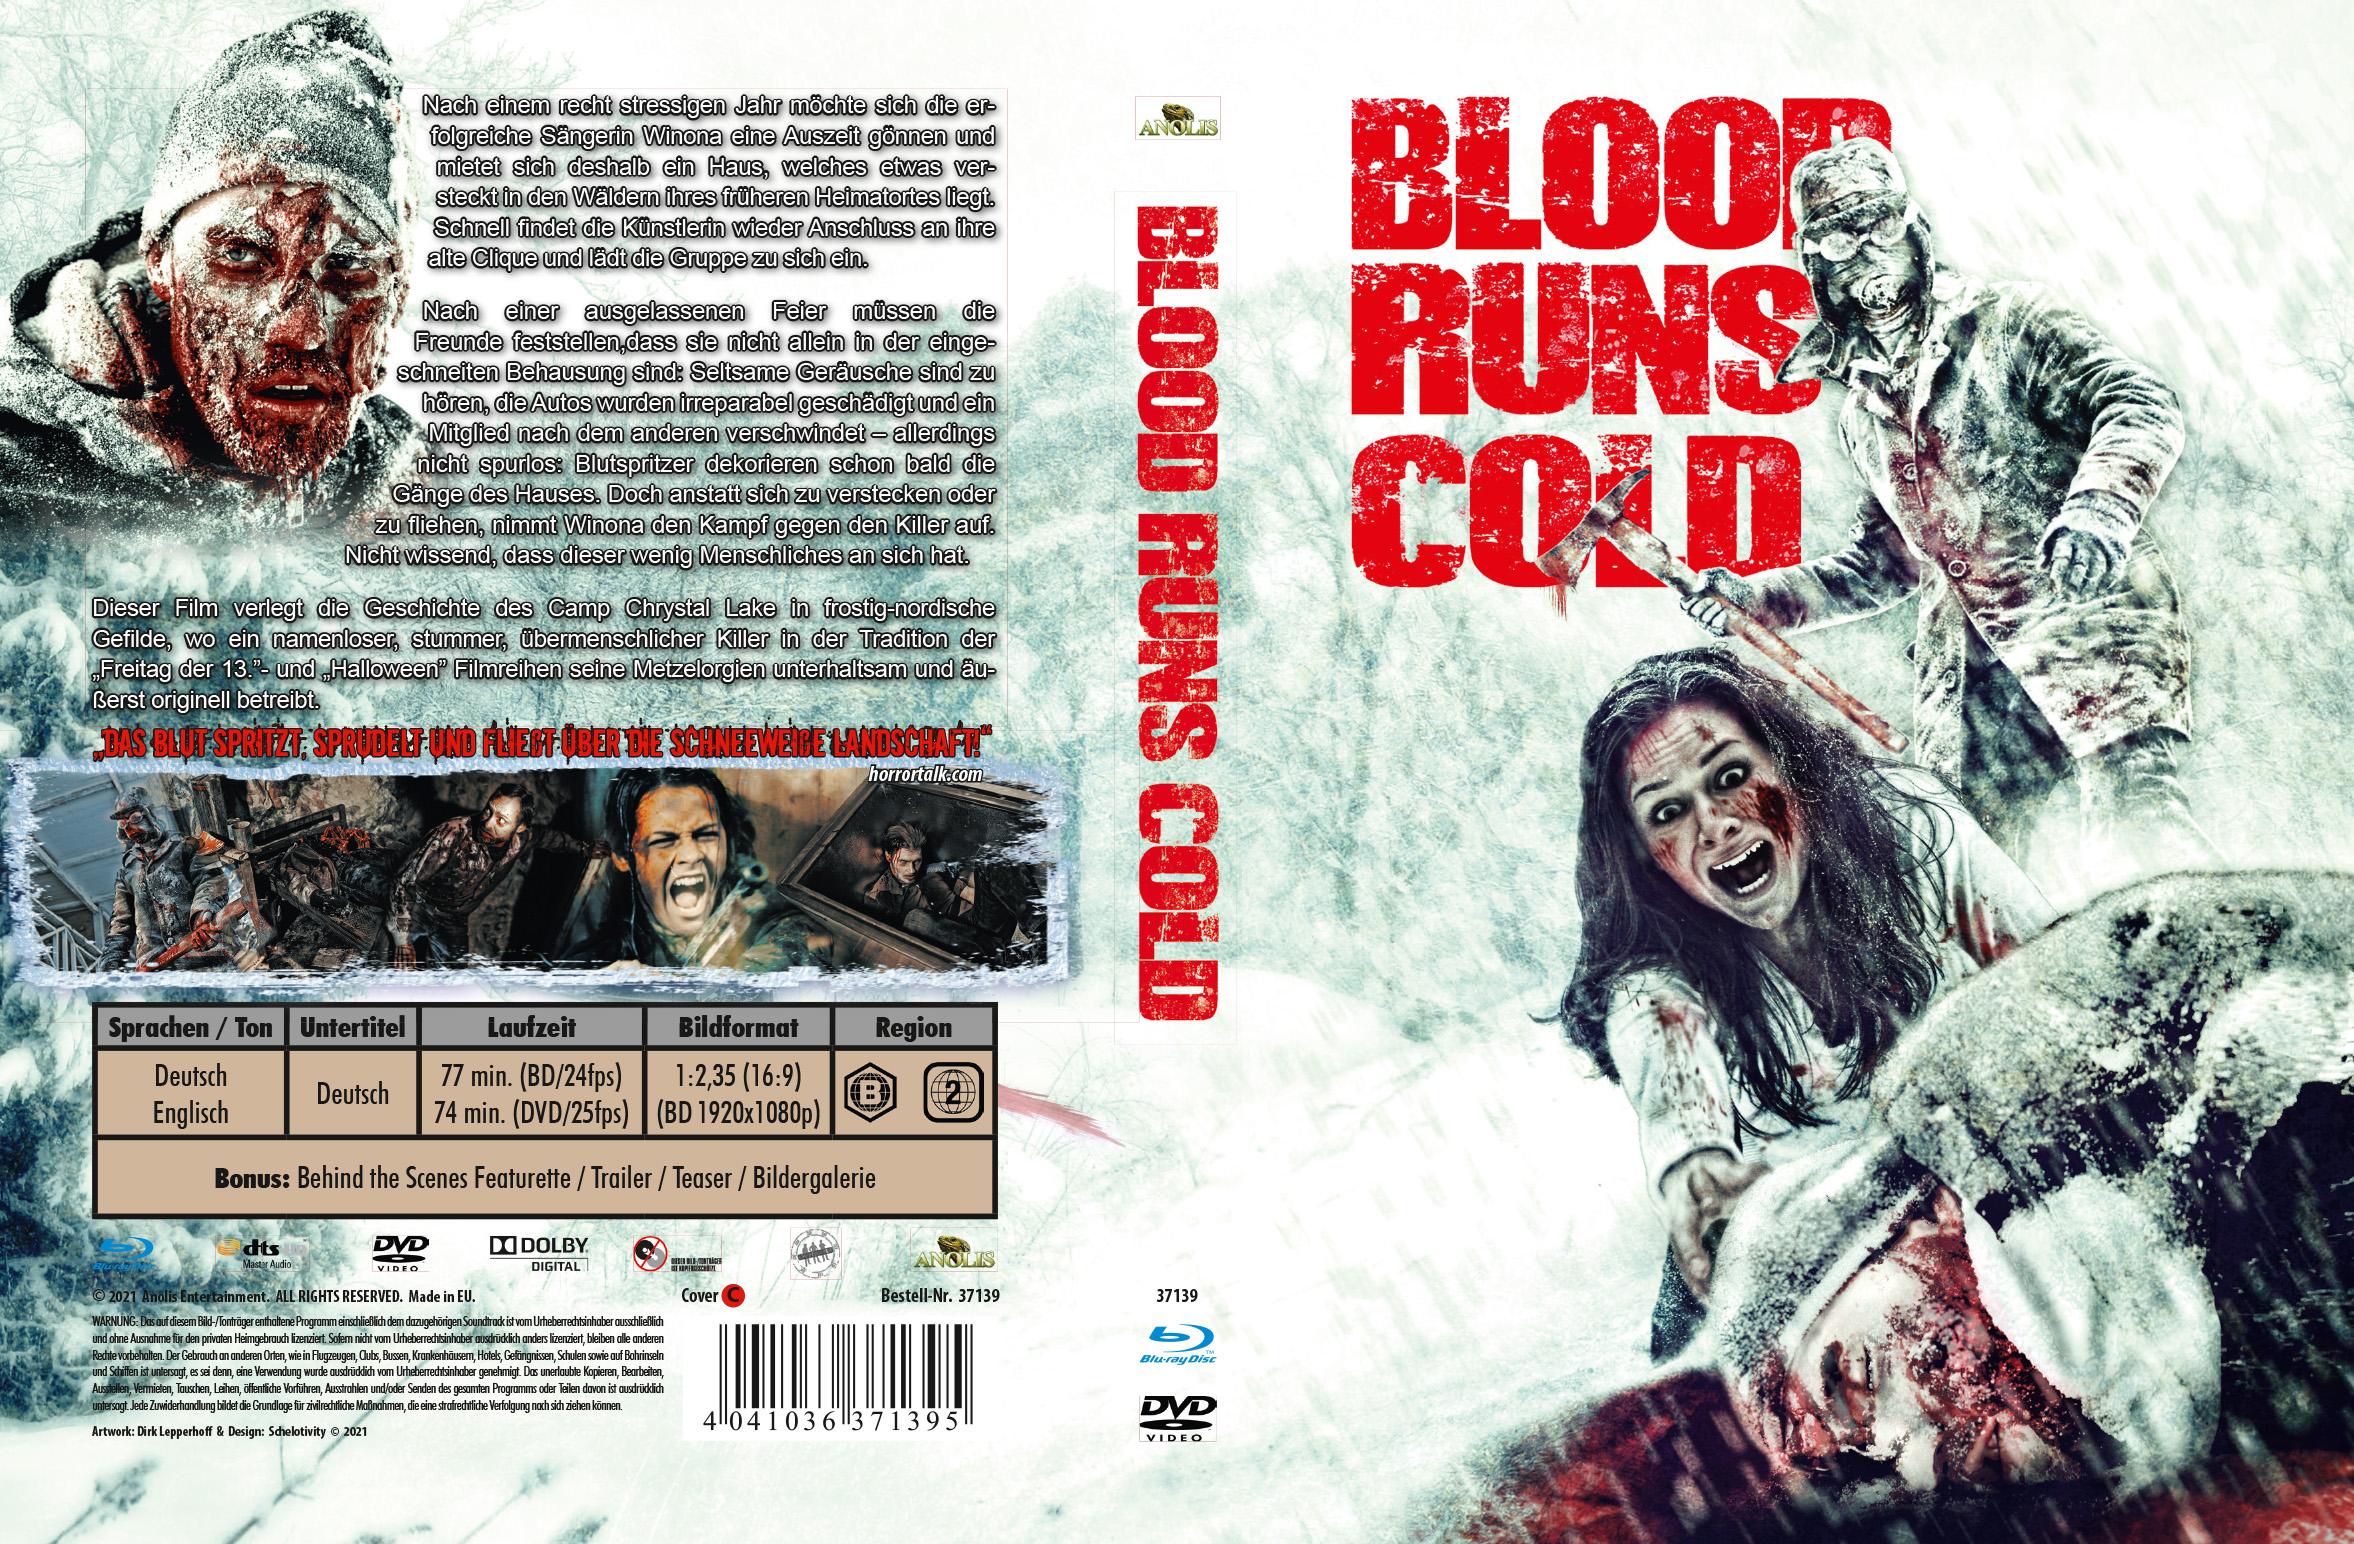 Divers_Blood-Runs-Cold (Mediabook Cover C)